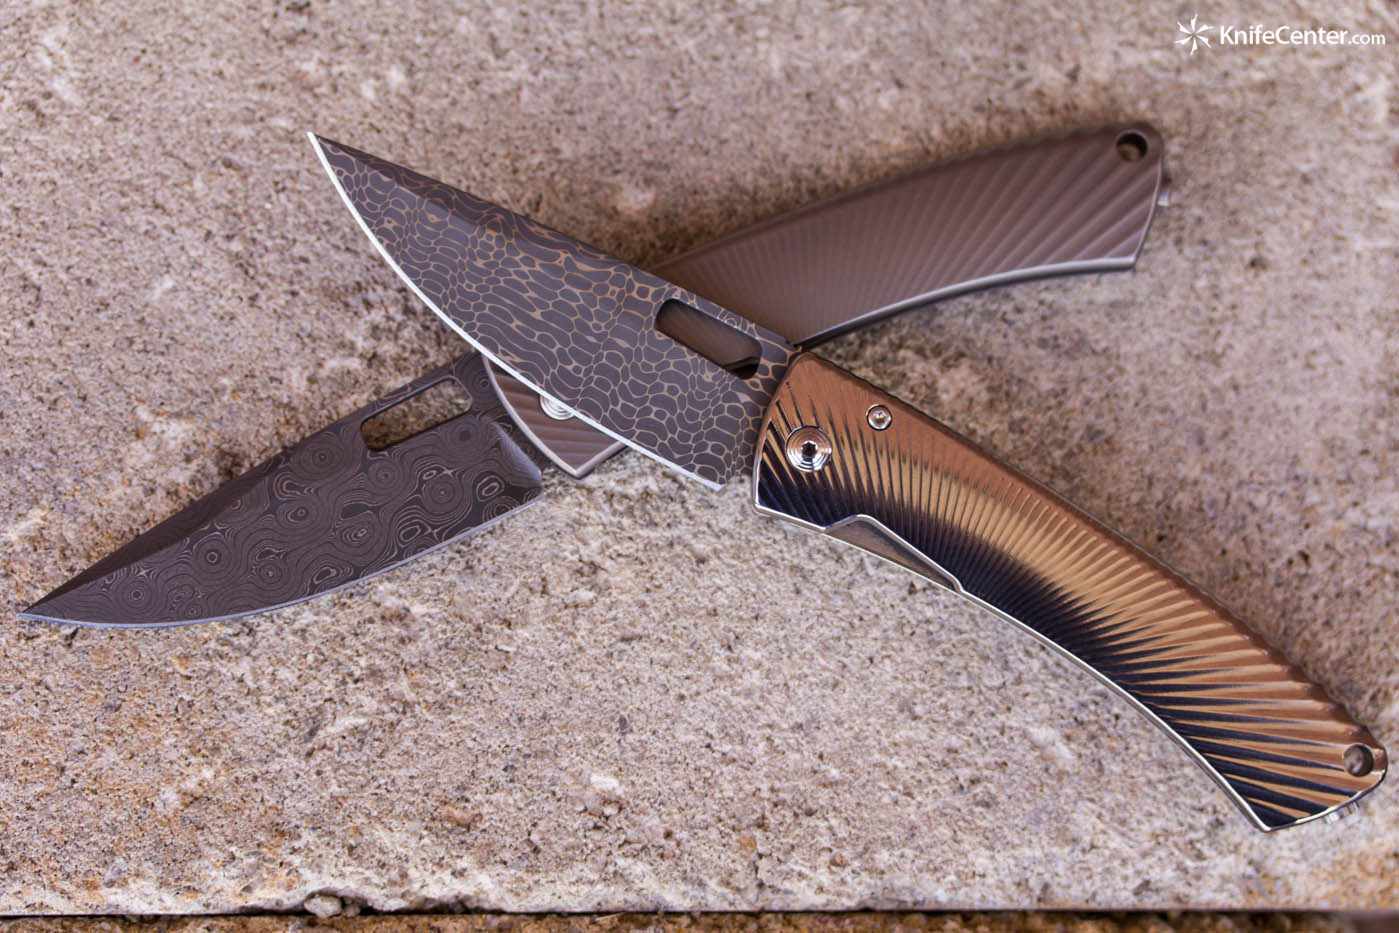 LionSteel Knives